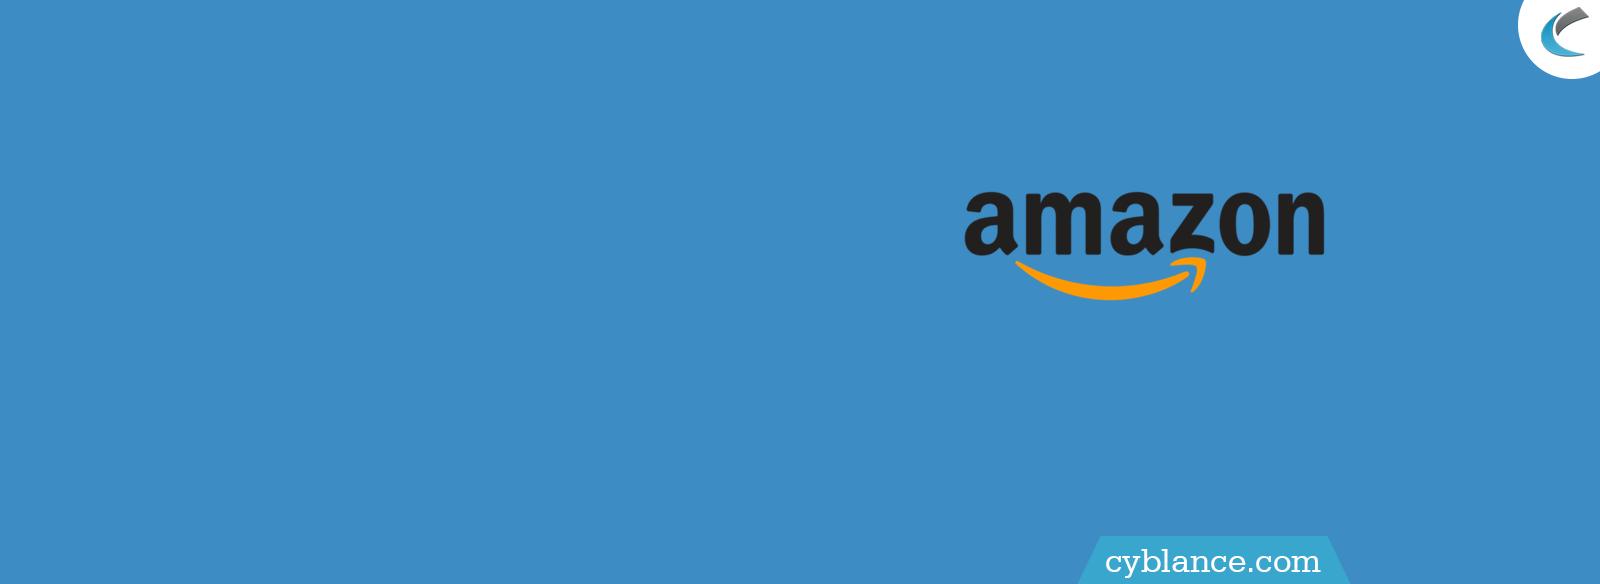 build a website like Amazon